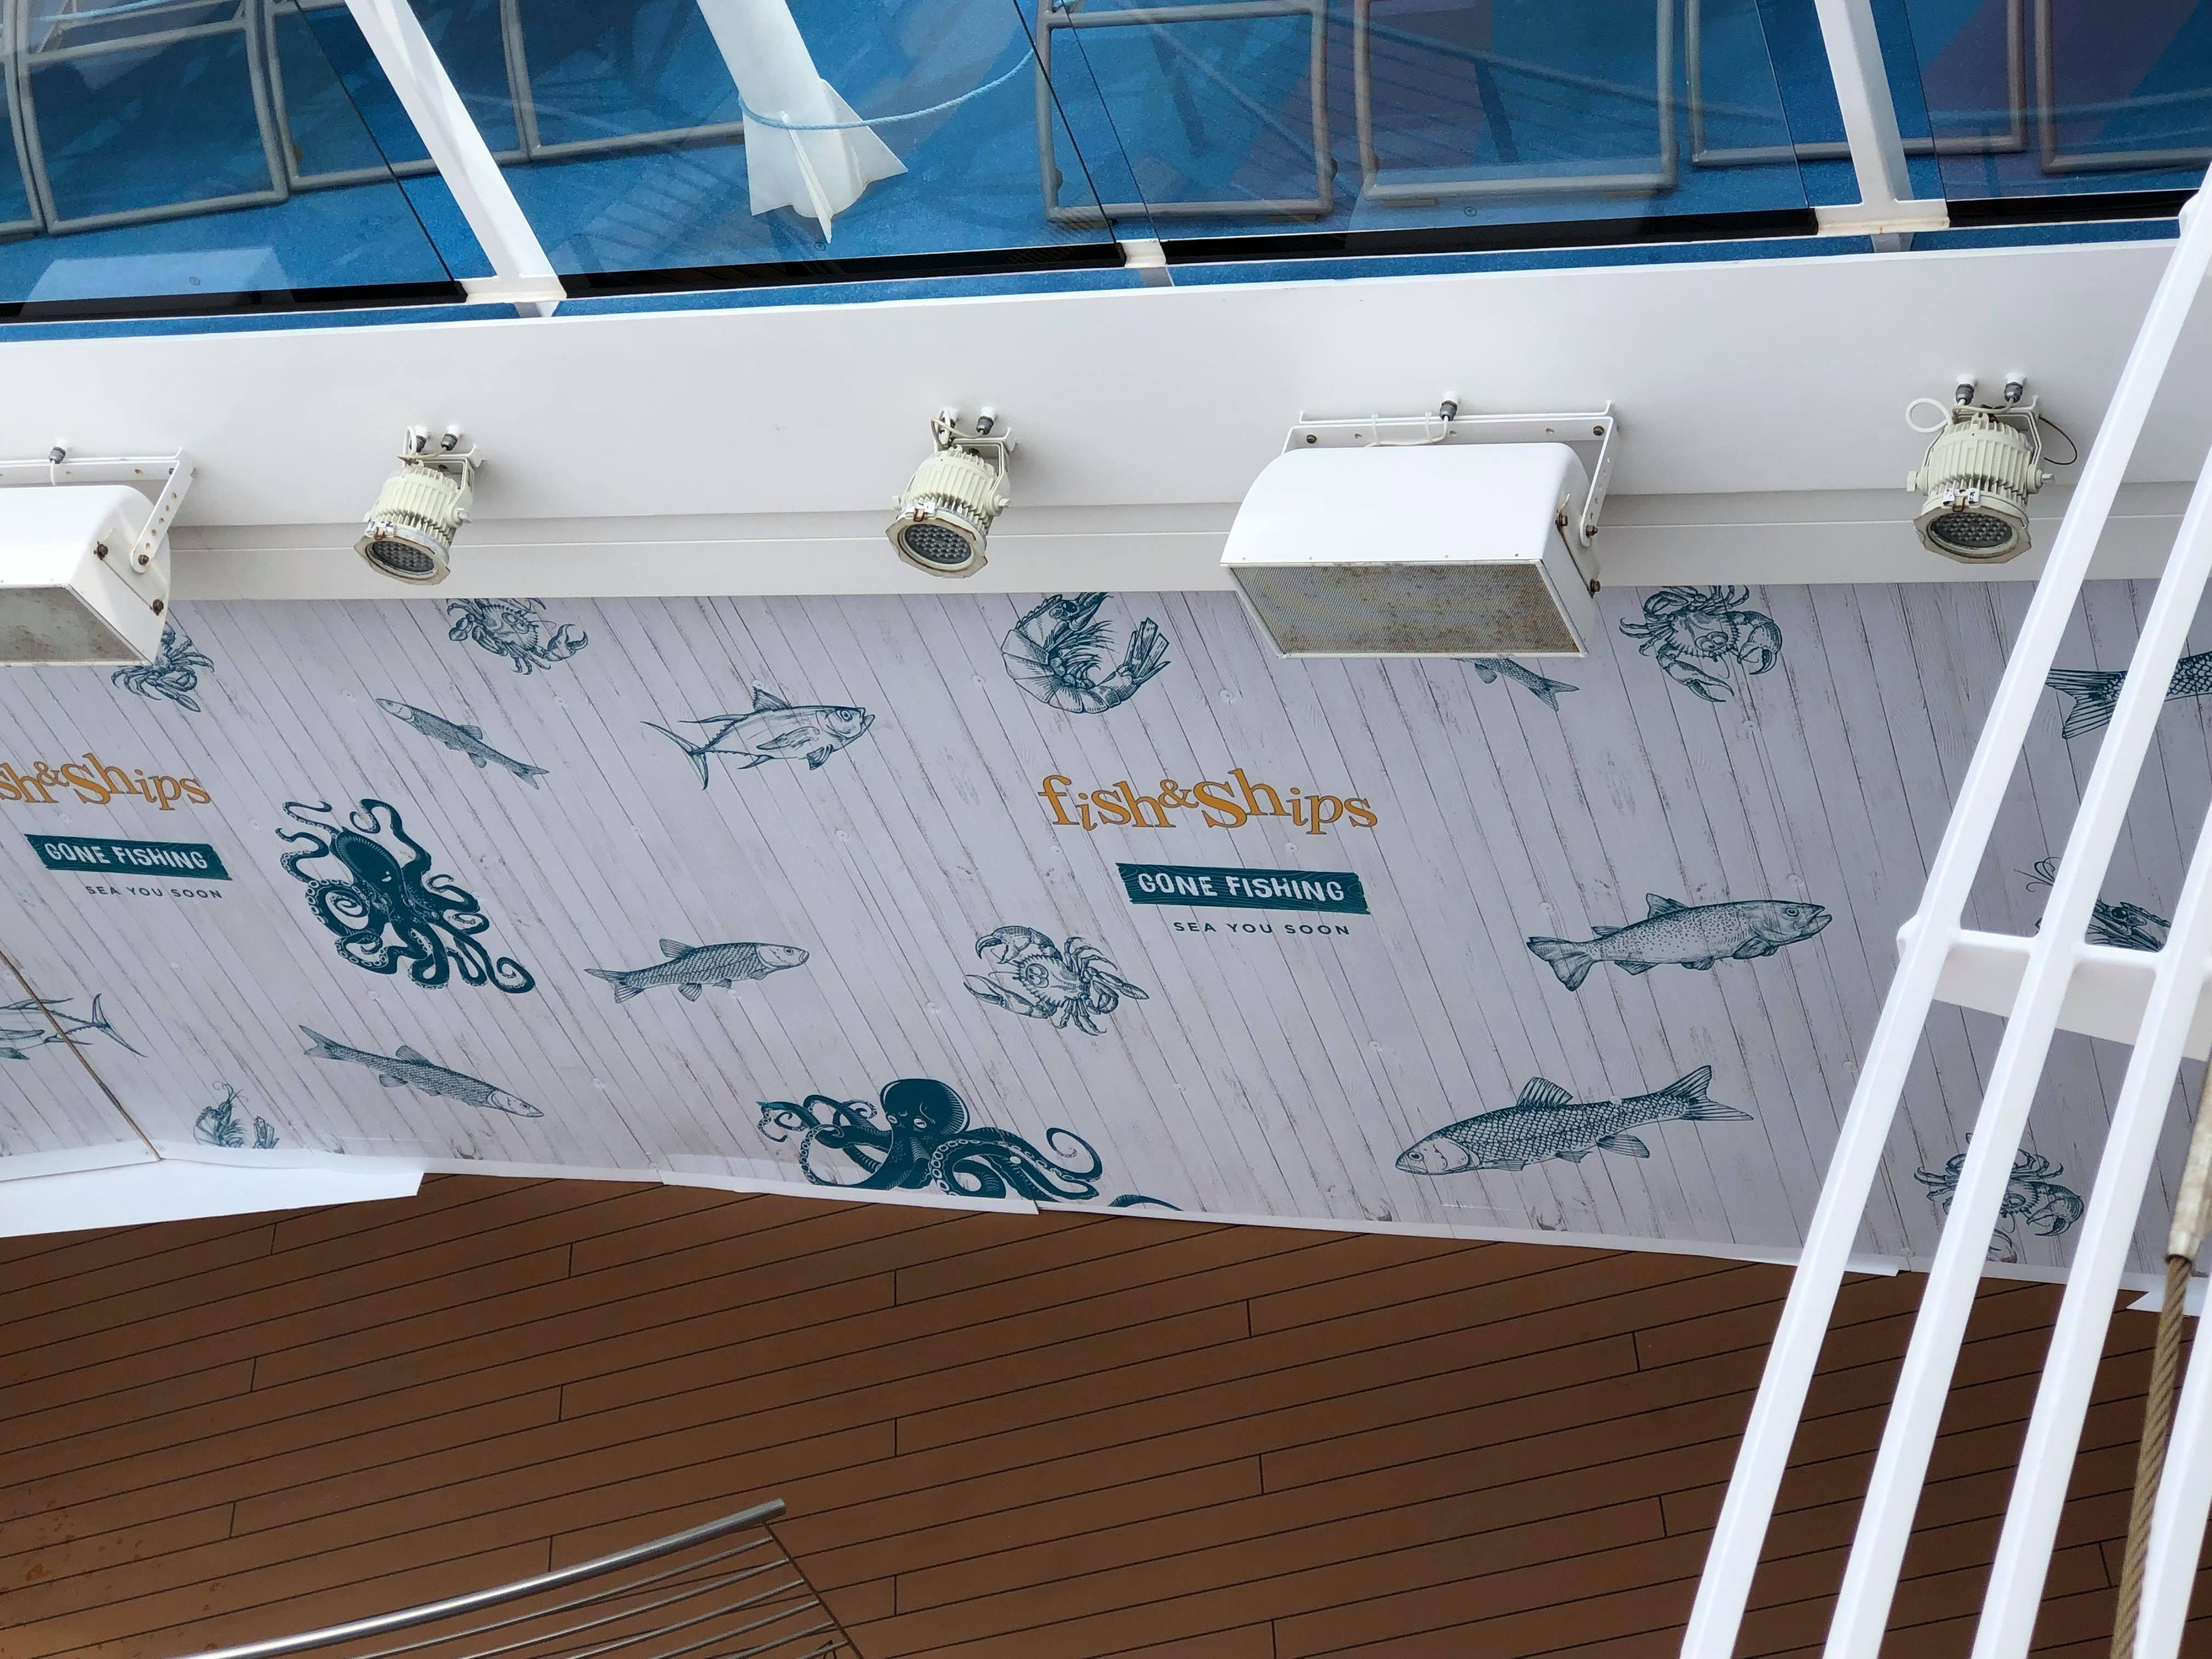 3f938b27b410 Royal Caribbean - Unofficial blog about Royal Caribbean Cruise Line